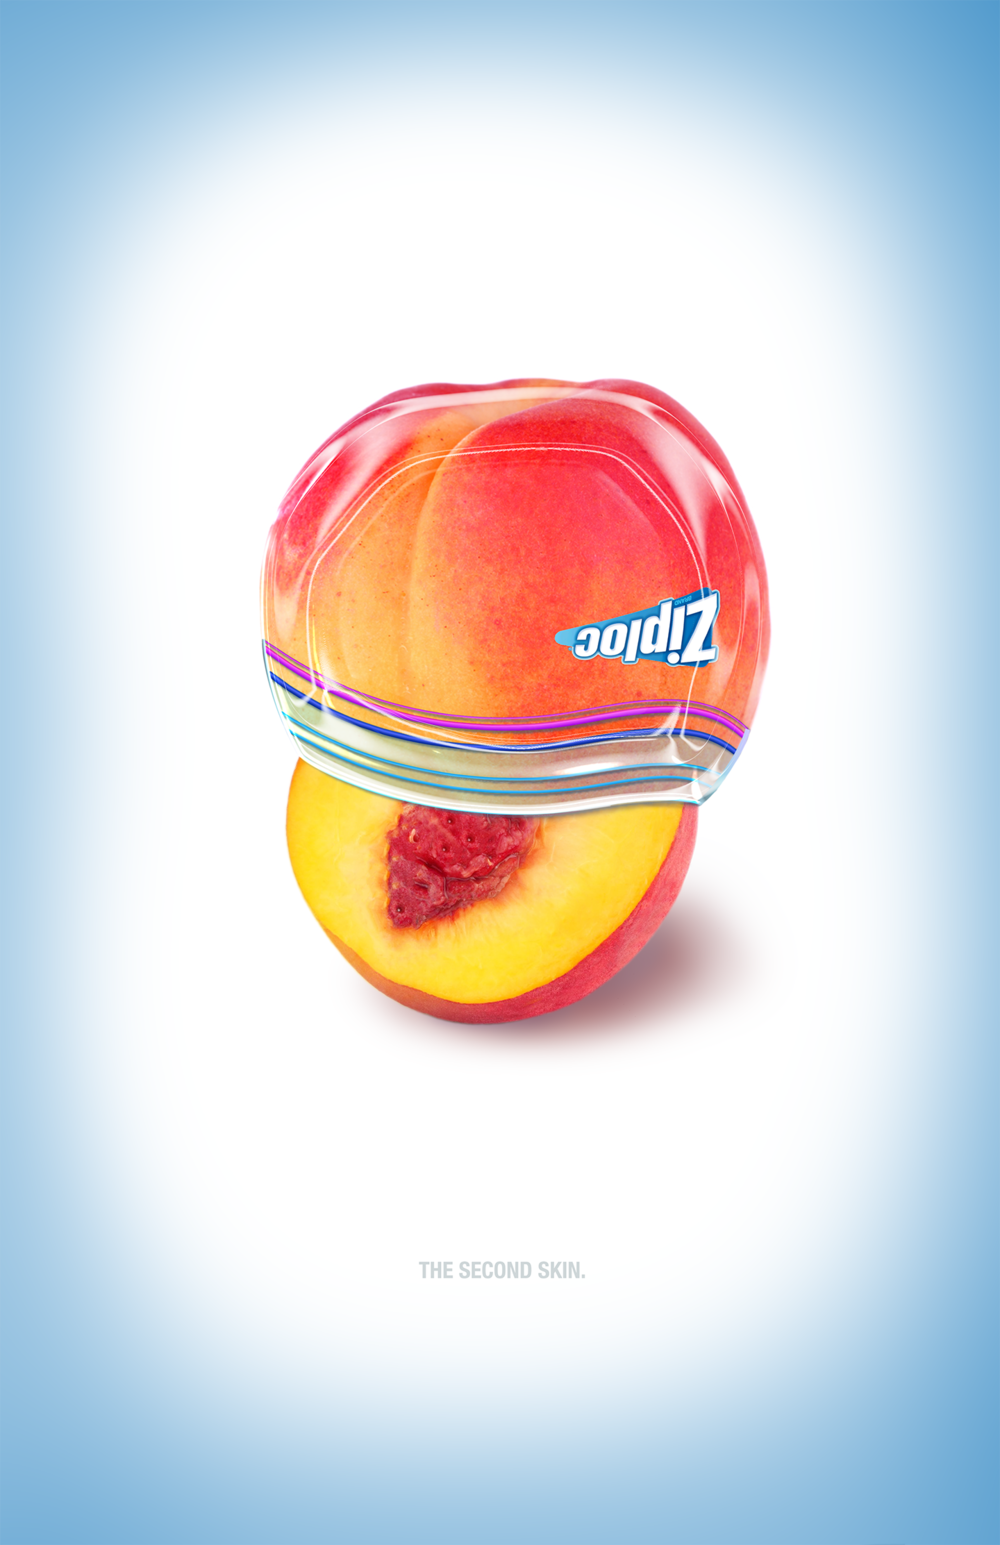 peachfinal-sizesmall.png